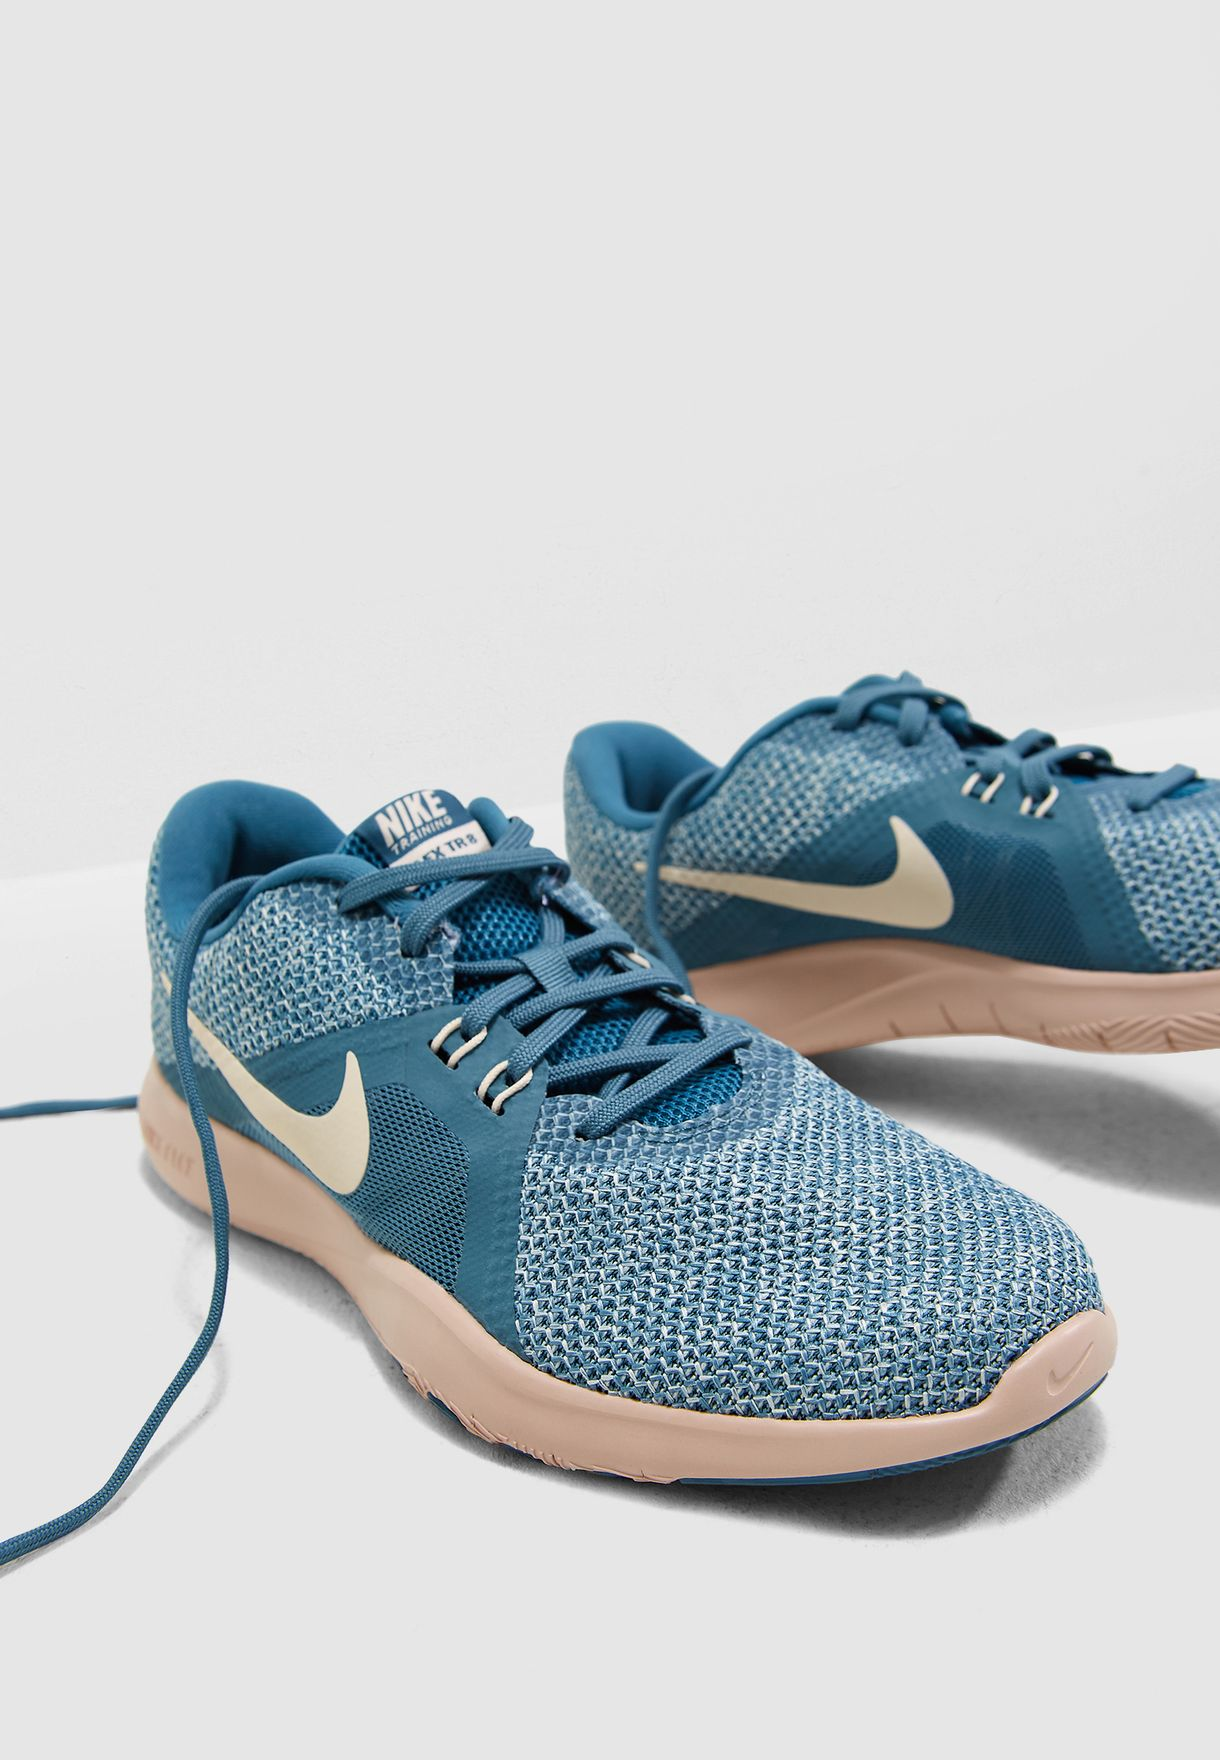 a0247cdd4a2fa Shop Nike multicolor Flex Trainer 8 924339-400 for Women in UAE ...